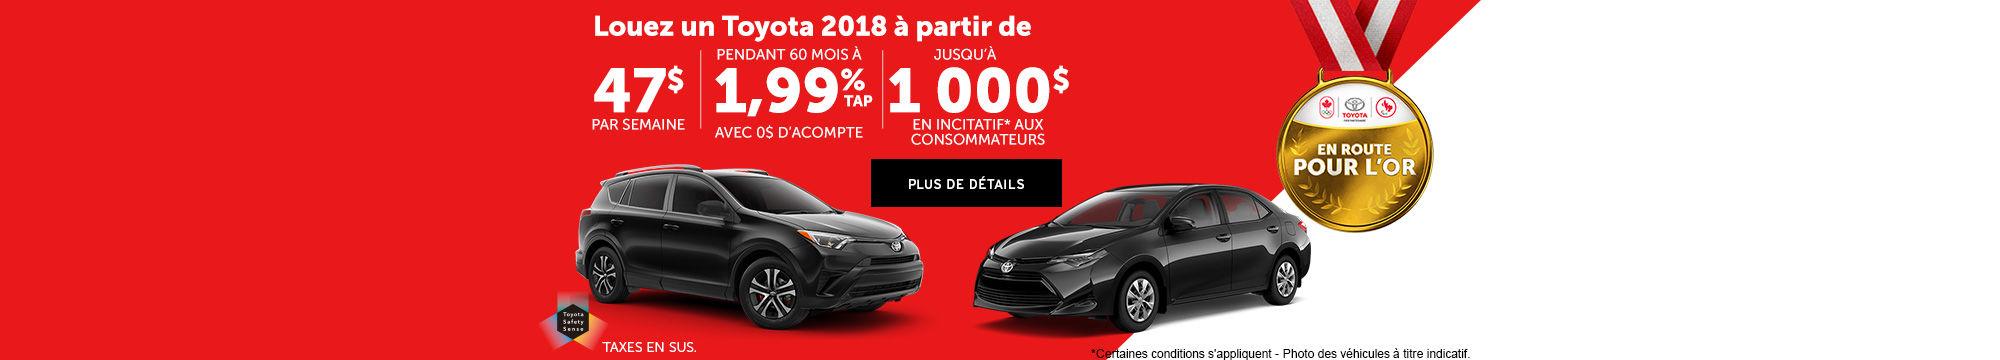 Toyota janvier